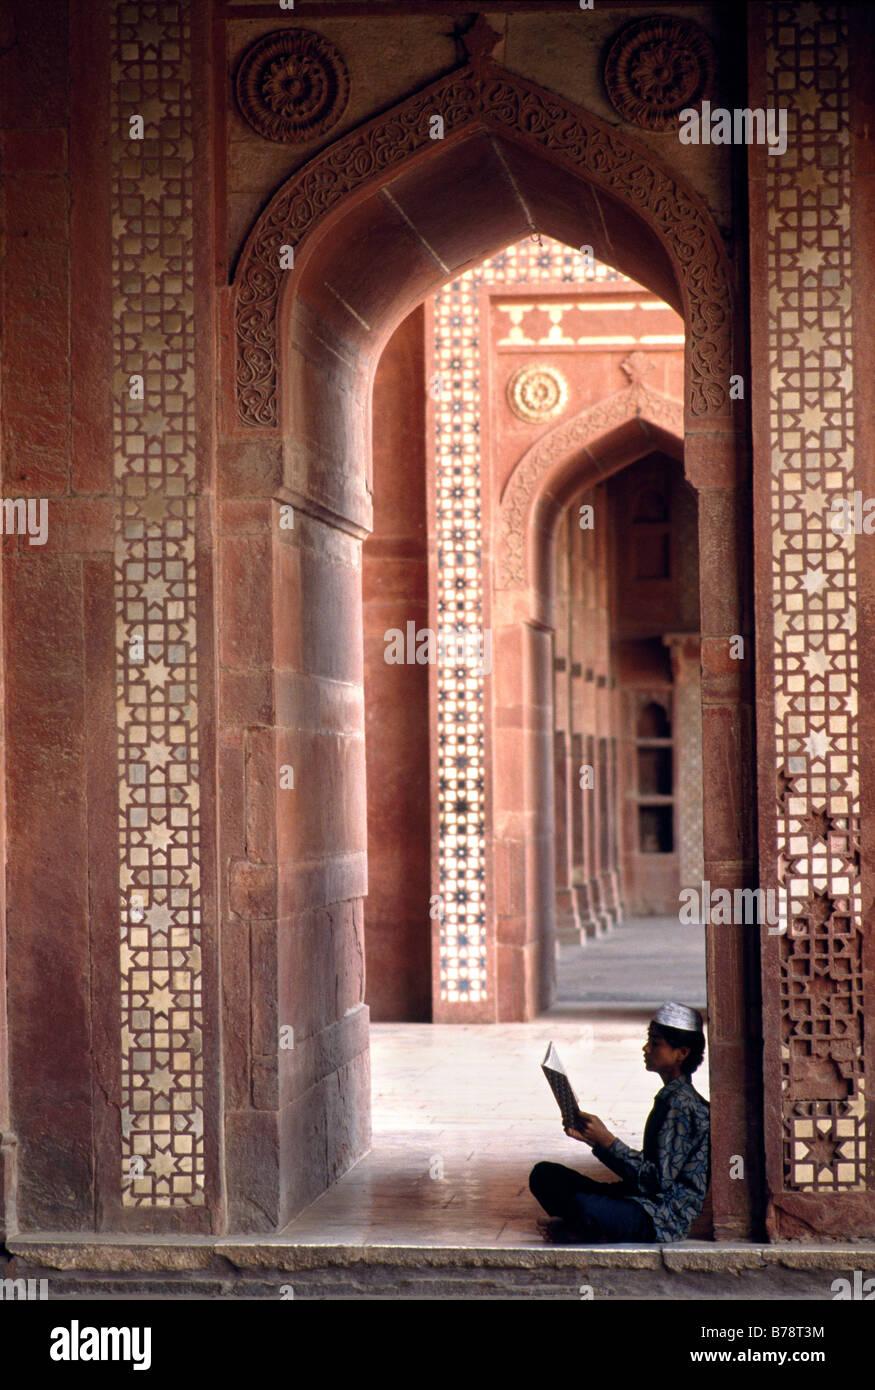 Muslim, prayer, Schah Jahan-mosque, Delhi, India, Asia - Stock Image